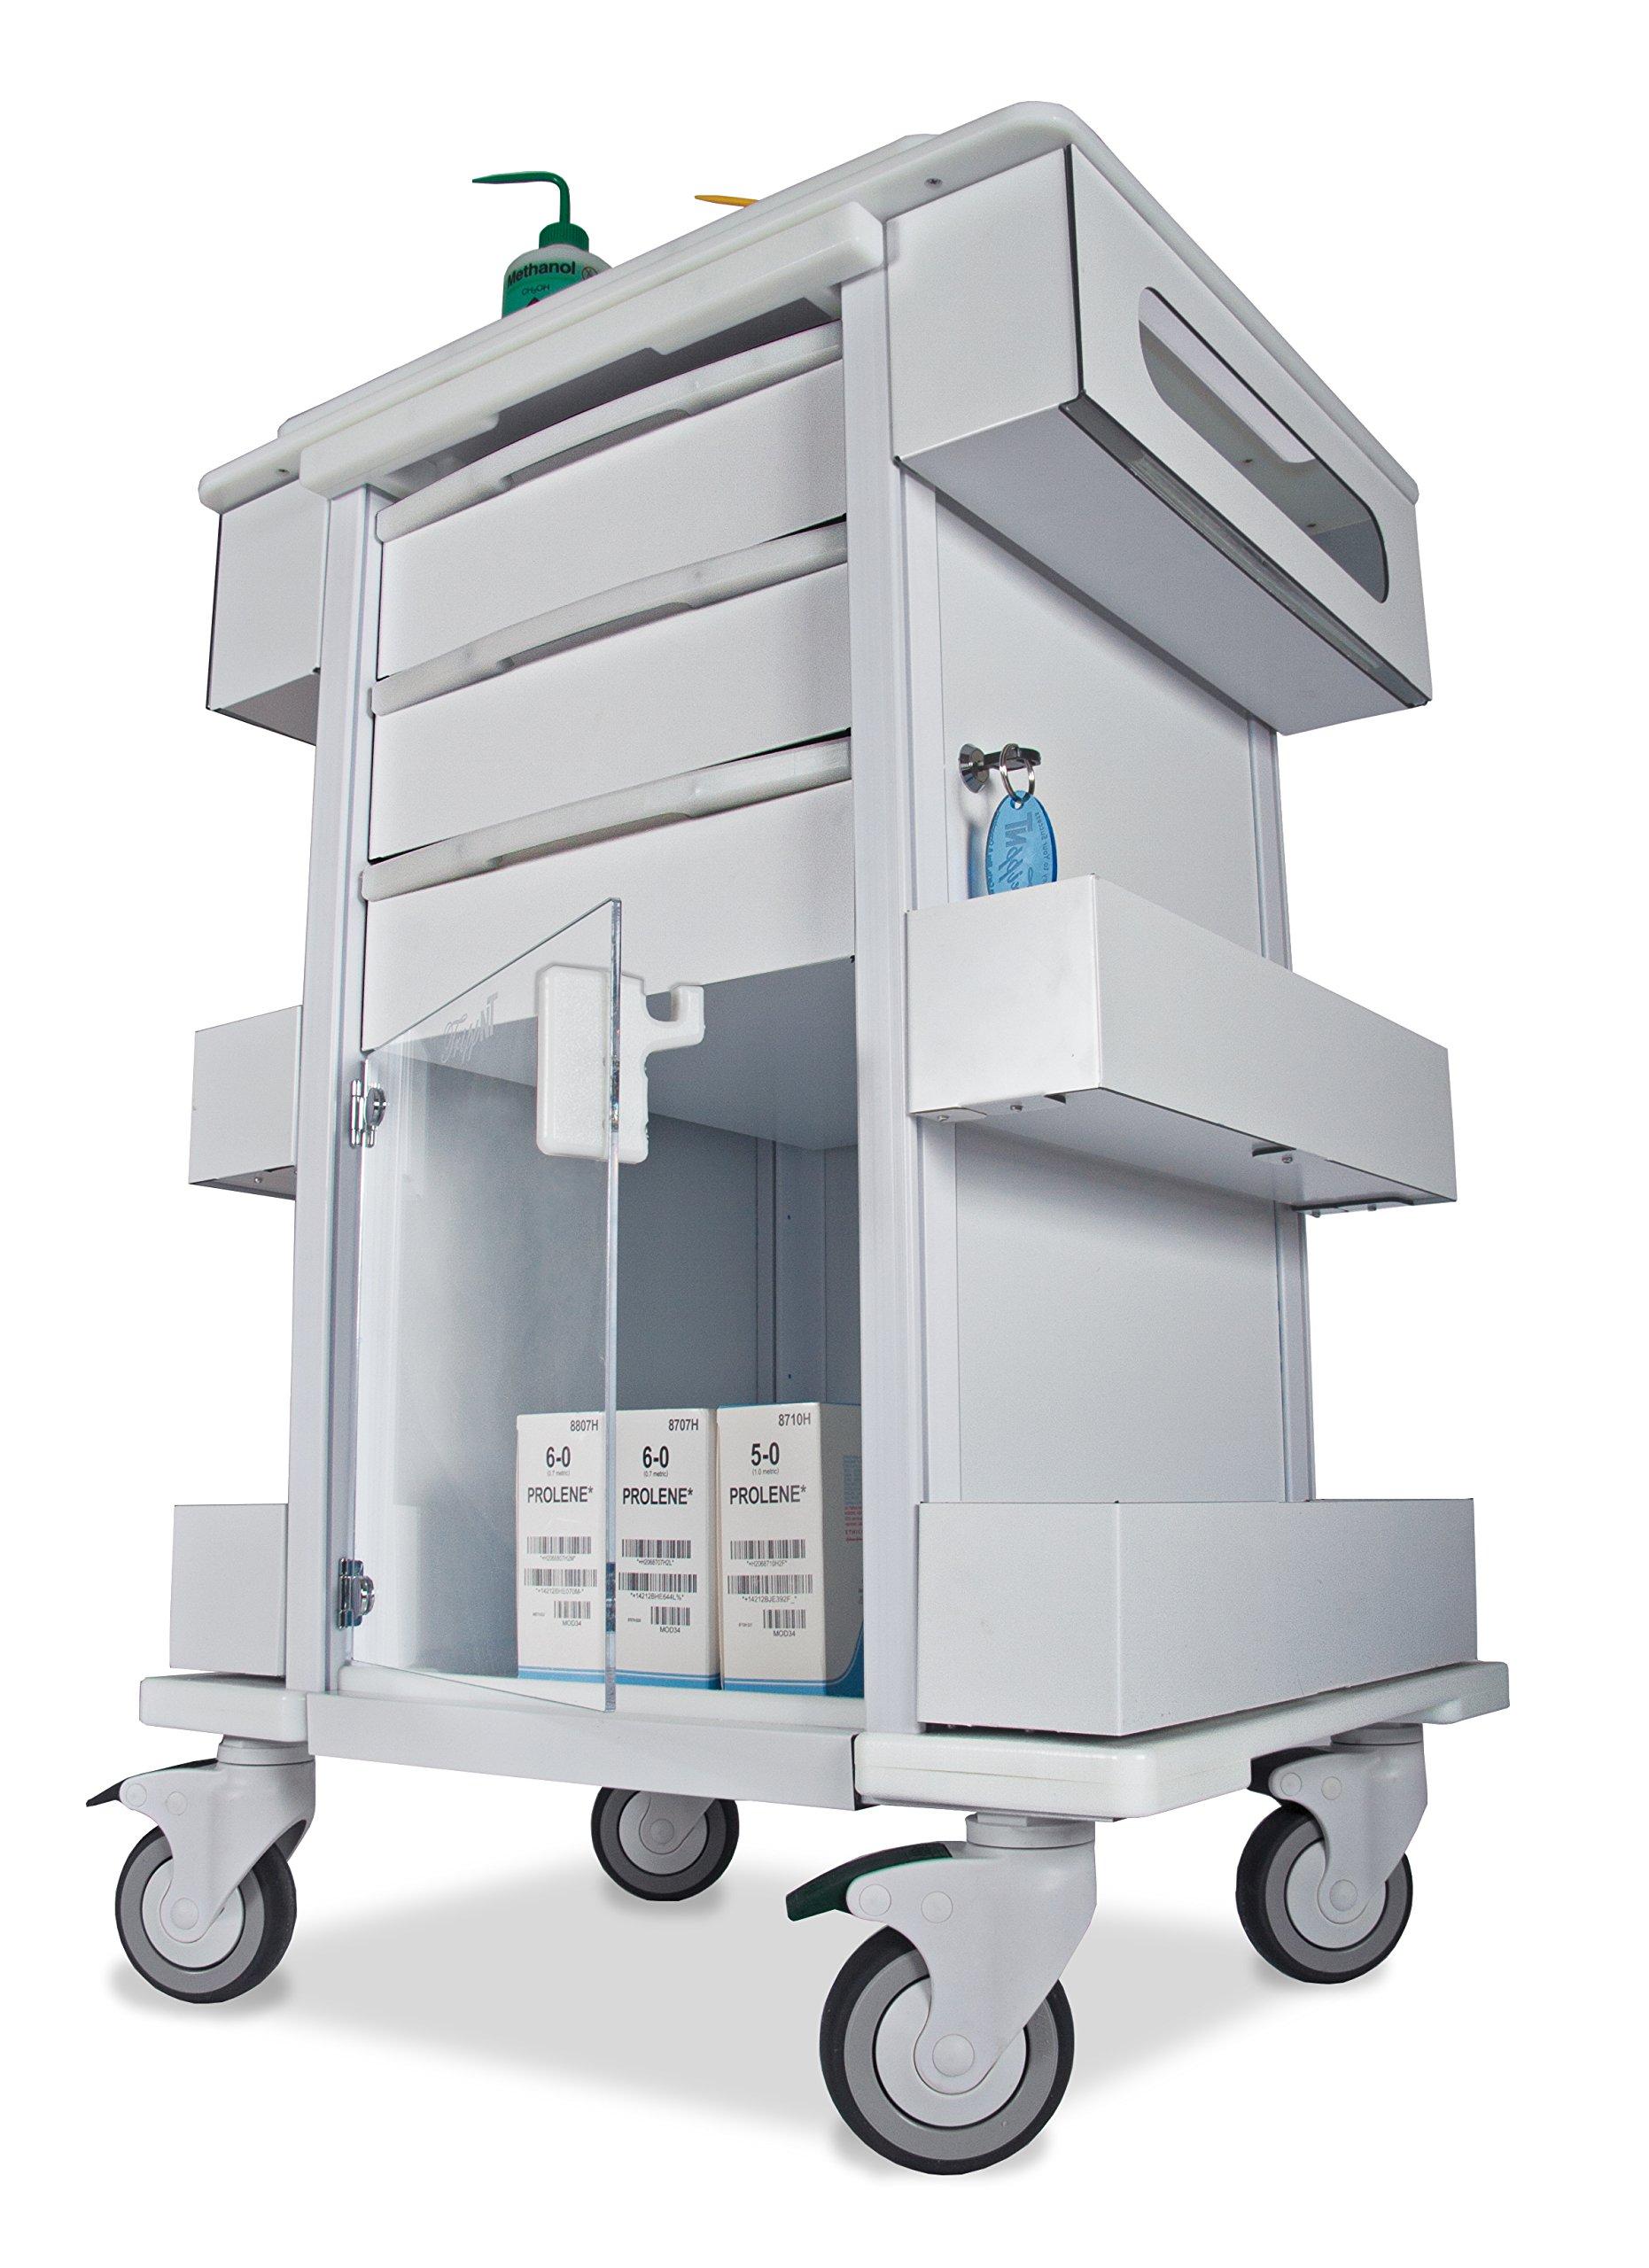 TrippNT 51463 Polyethylene/Aluminum Element 01 All Purpose Healthcare Cart, 24'' W x 35'' H x 19'' D, White by TrippNT